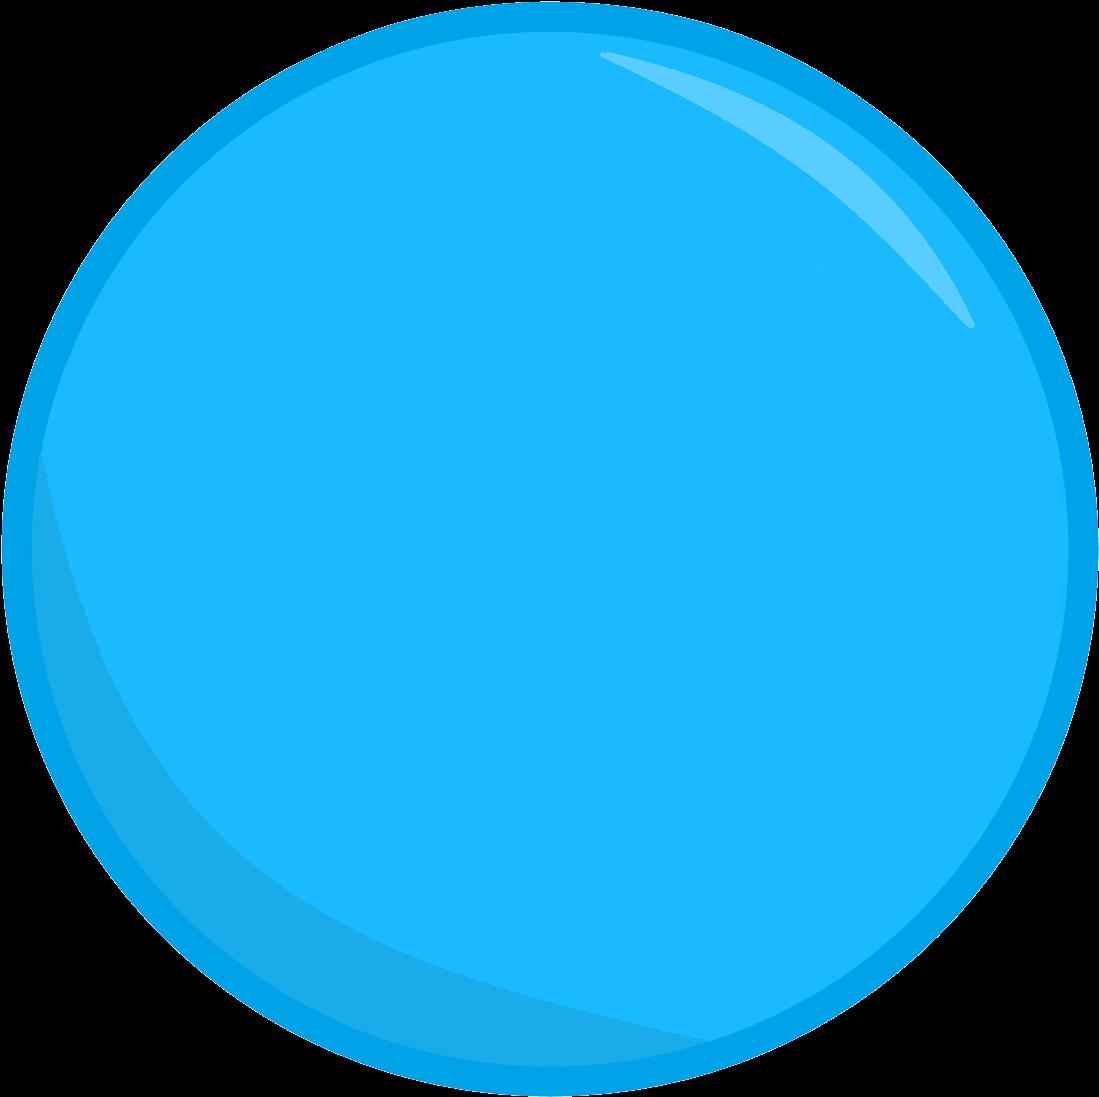 Clip Stock Object Mayhem Wiki Fandom - Blue Circle Banner ...